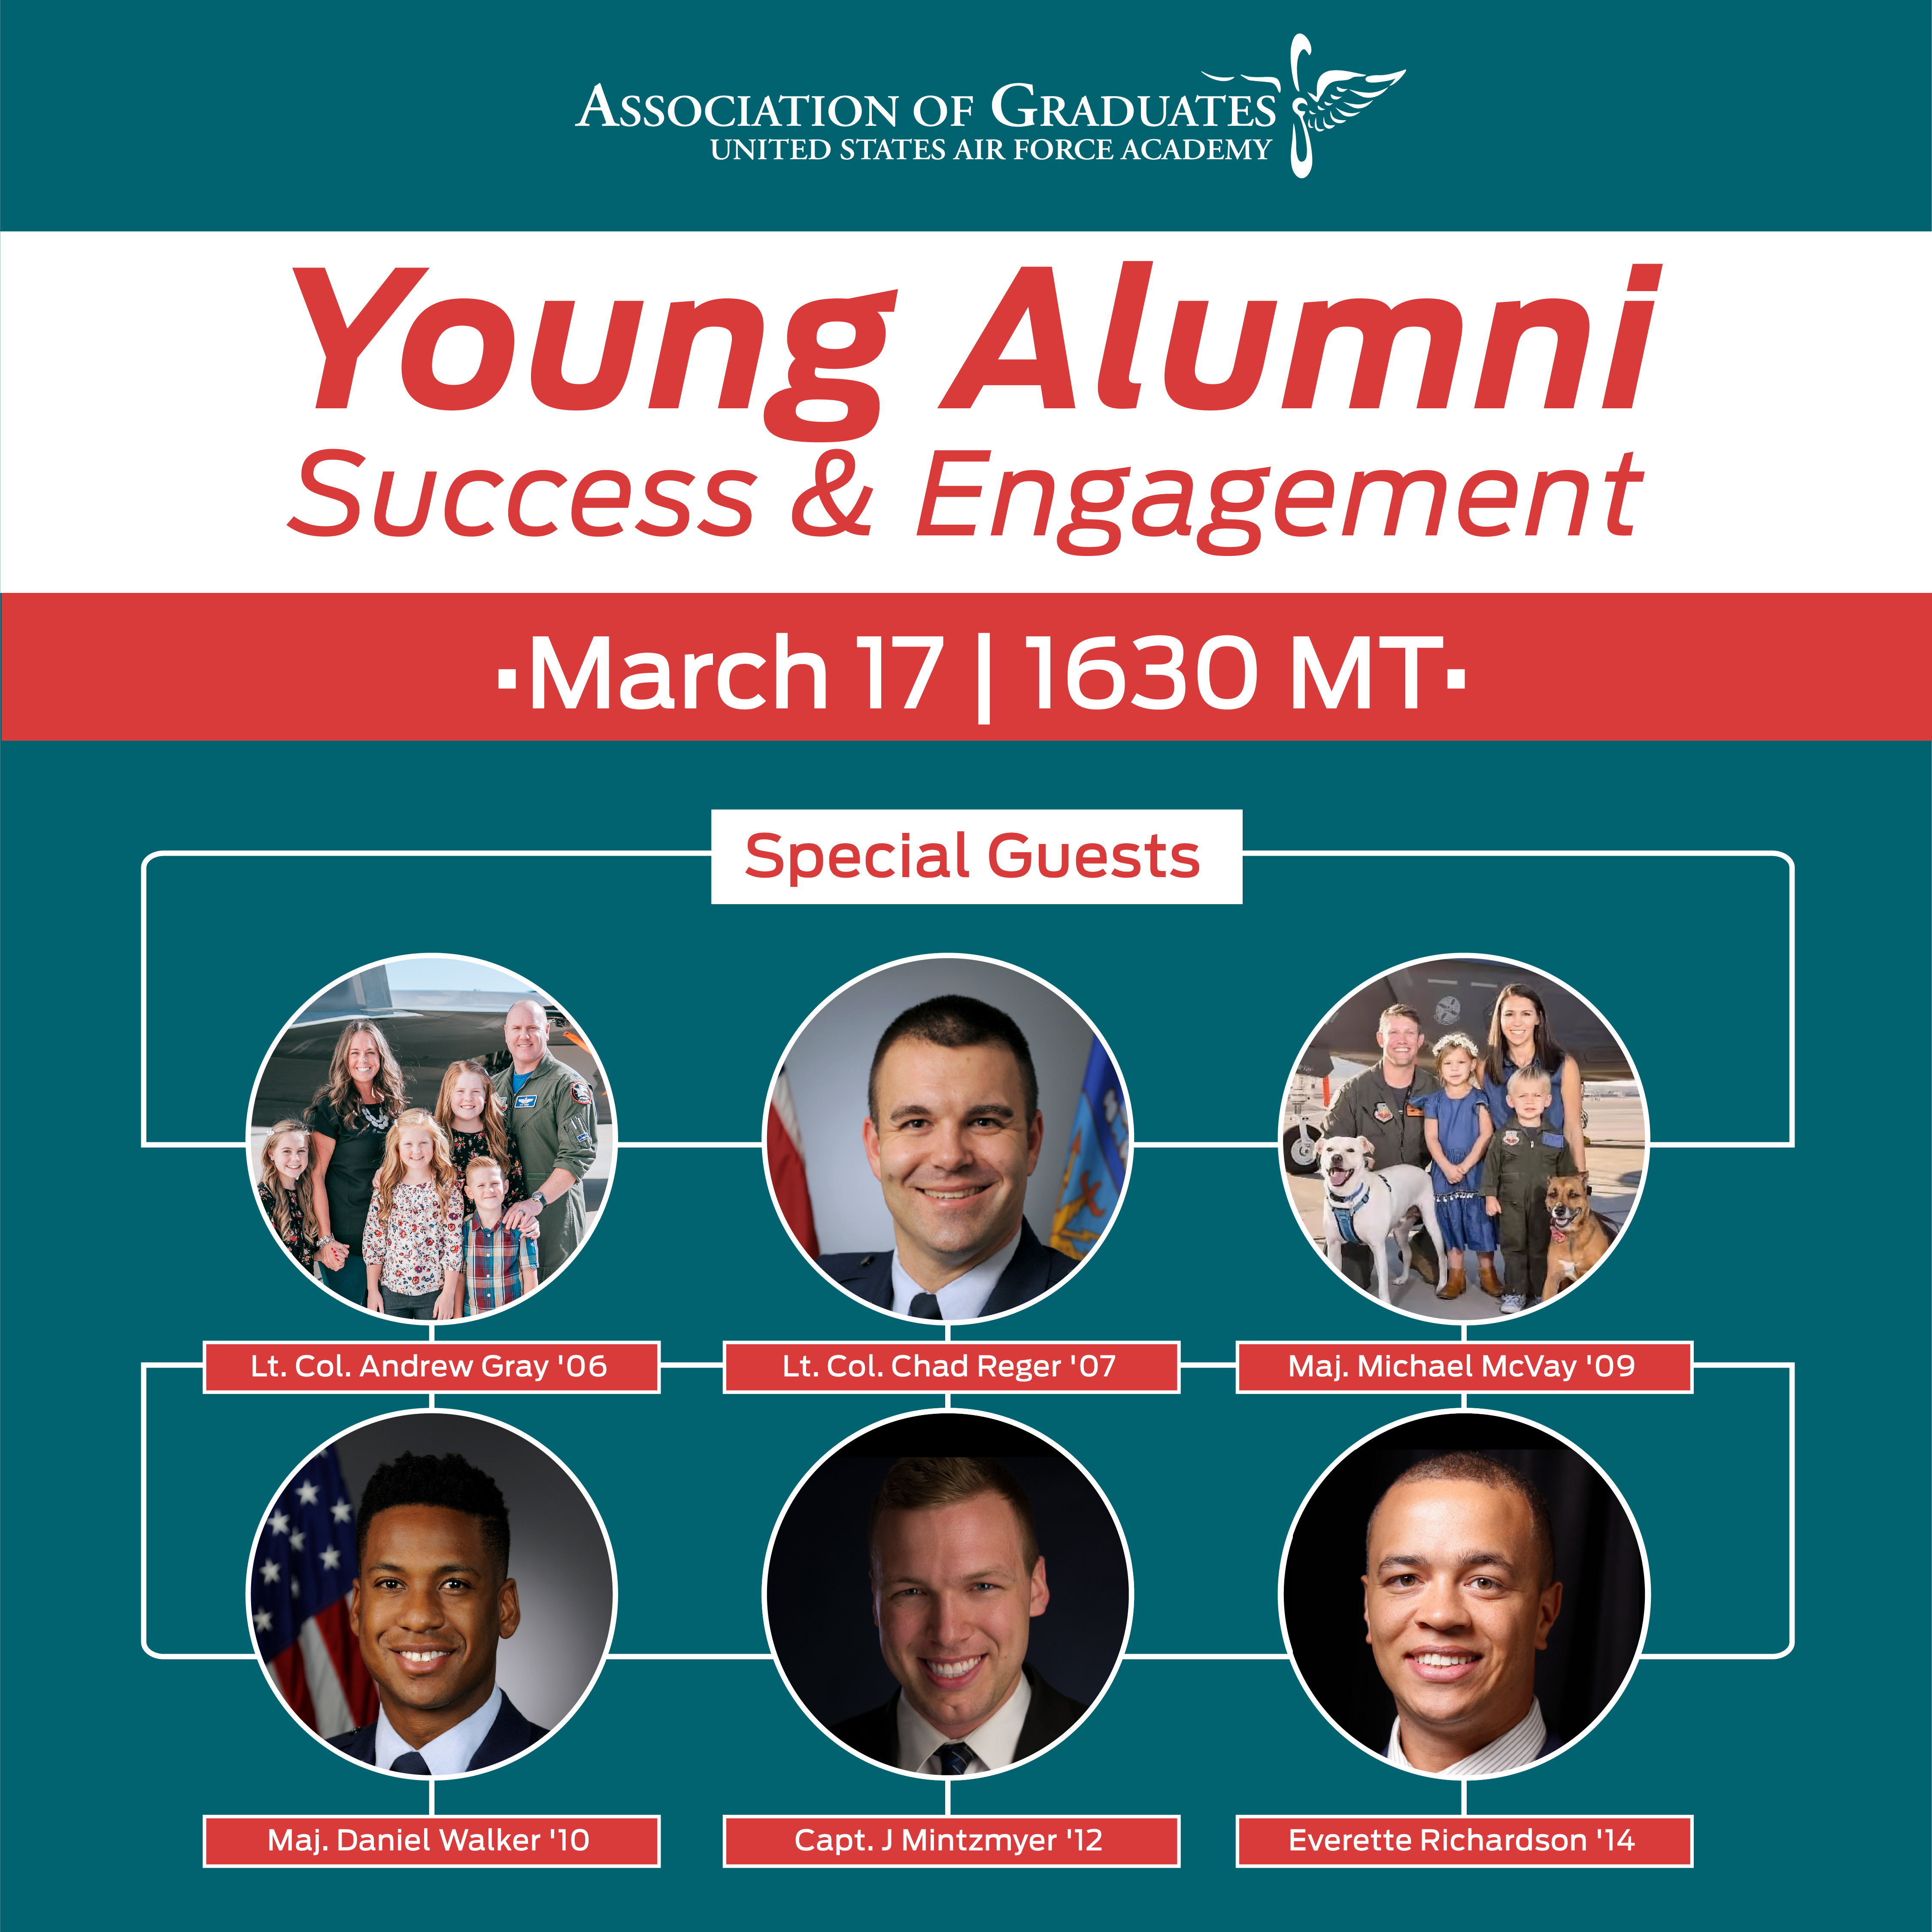 Image for Young Alumni Success & Engagement webinar